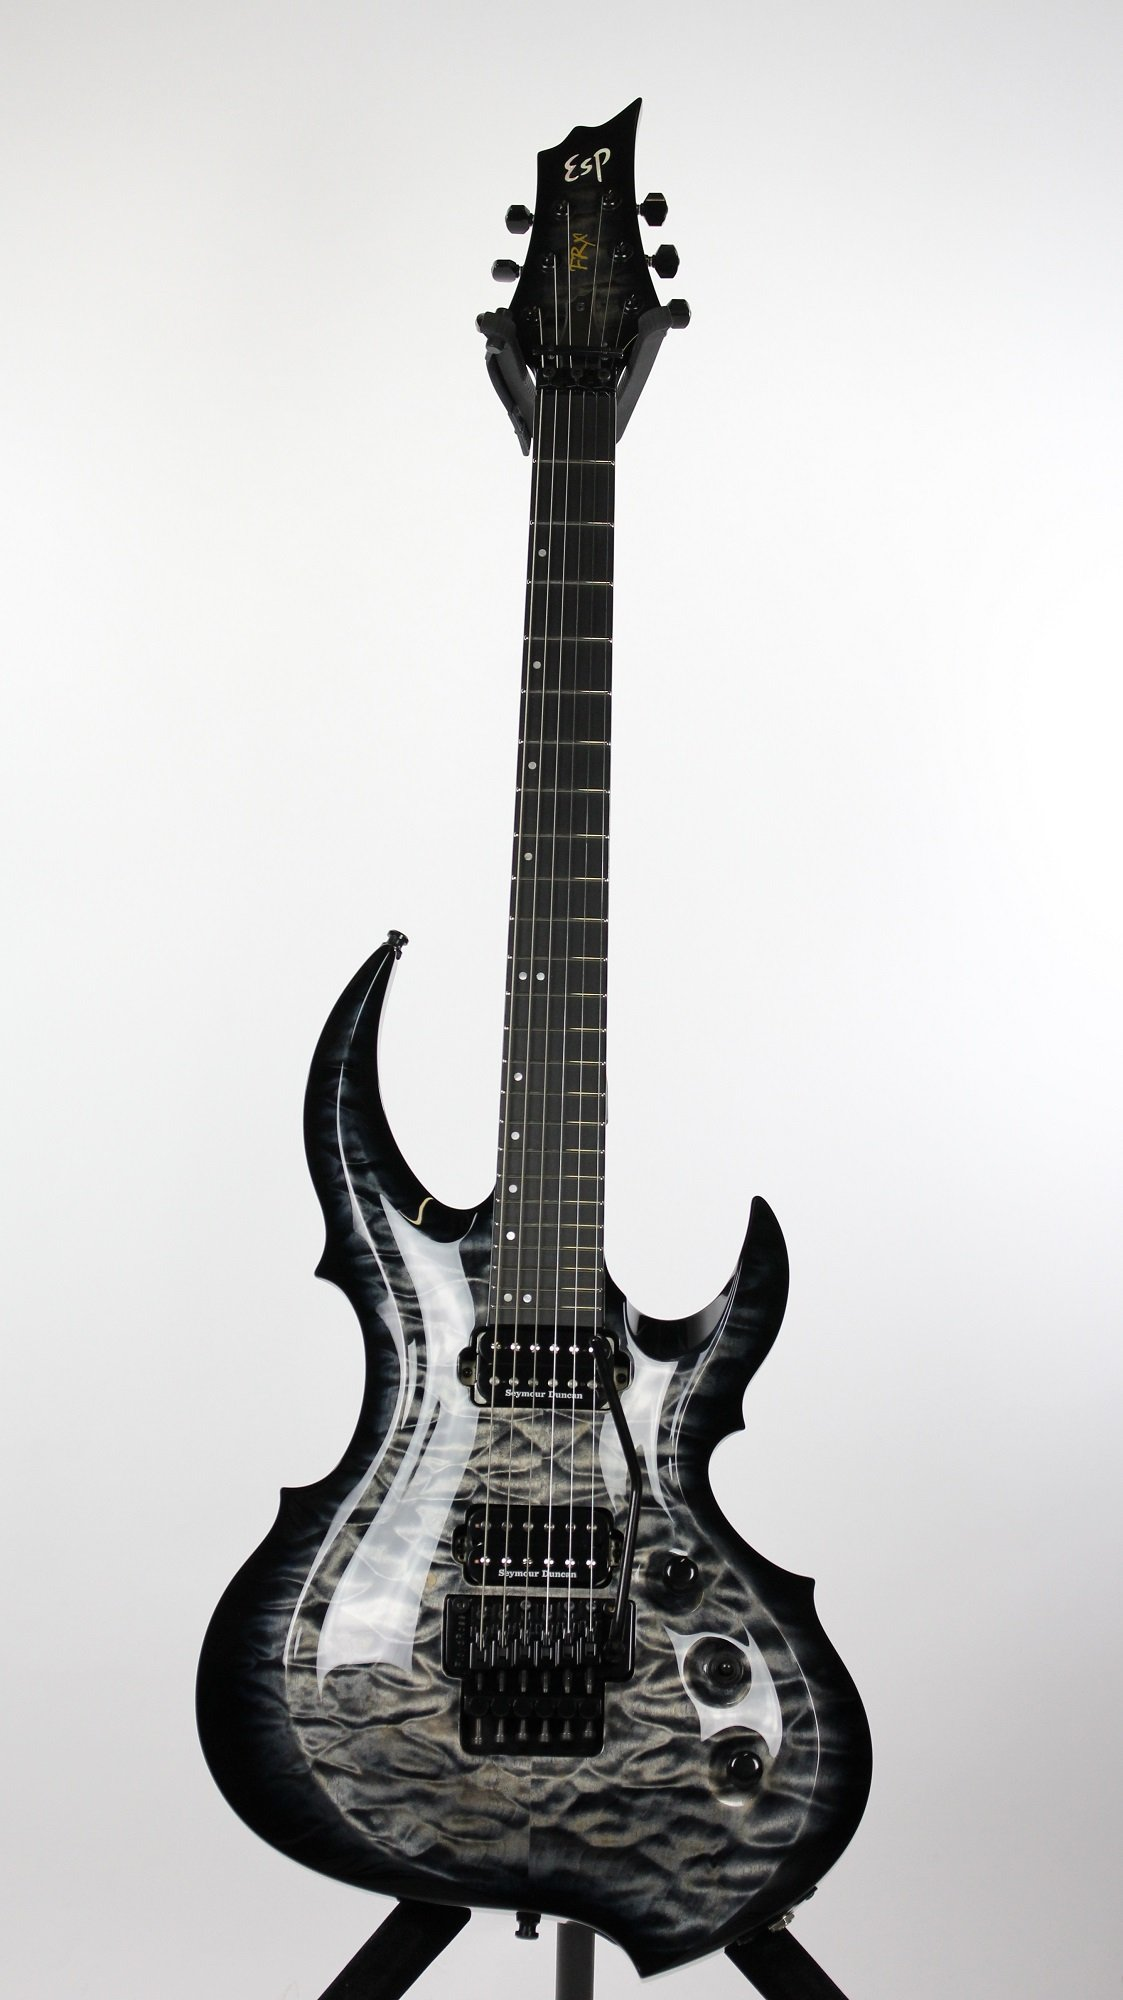 Cheap ESP Original Series FRX CTM See Thru Black Sunburst Electric Guitar 2014 Black Friday & Cyber Monday 2019